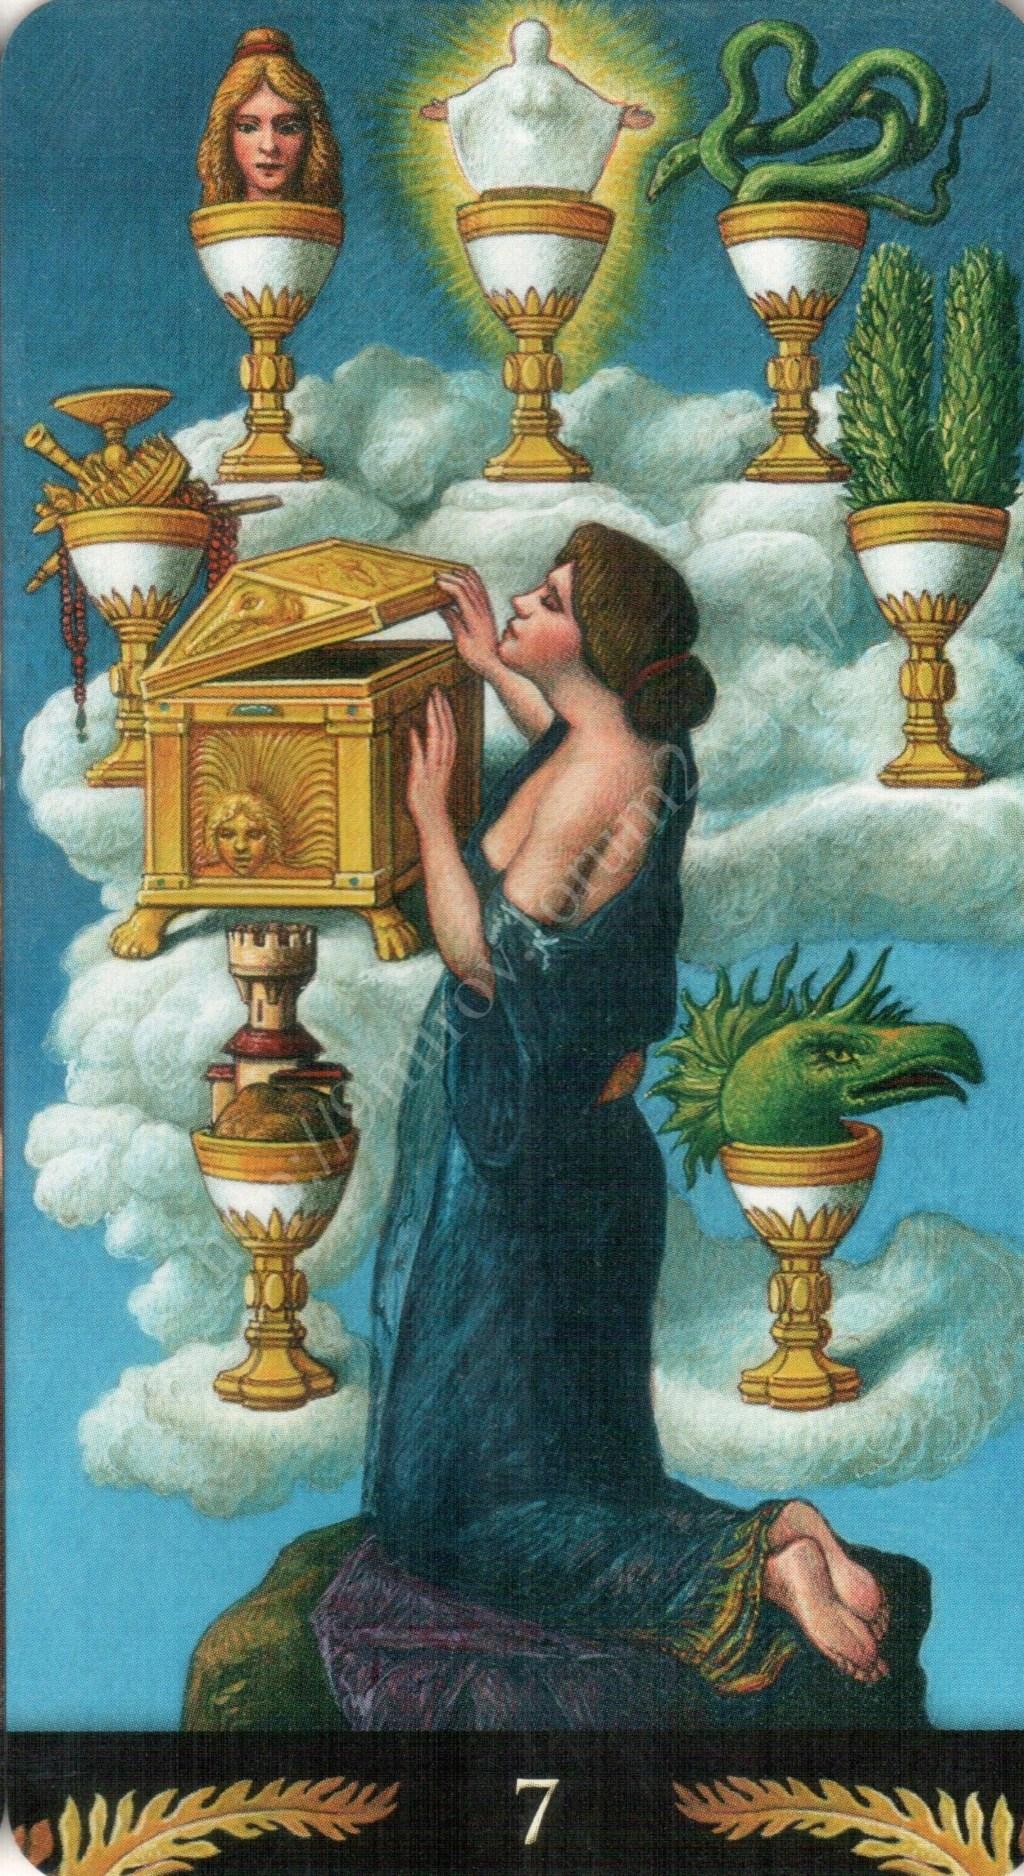 Таро Прерафаэлитов (Pre-Raphaelite Tarot) Галерея Water393